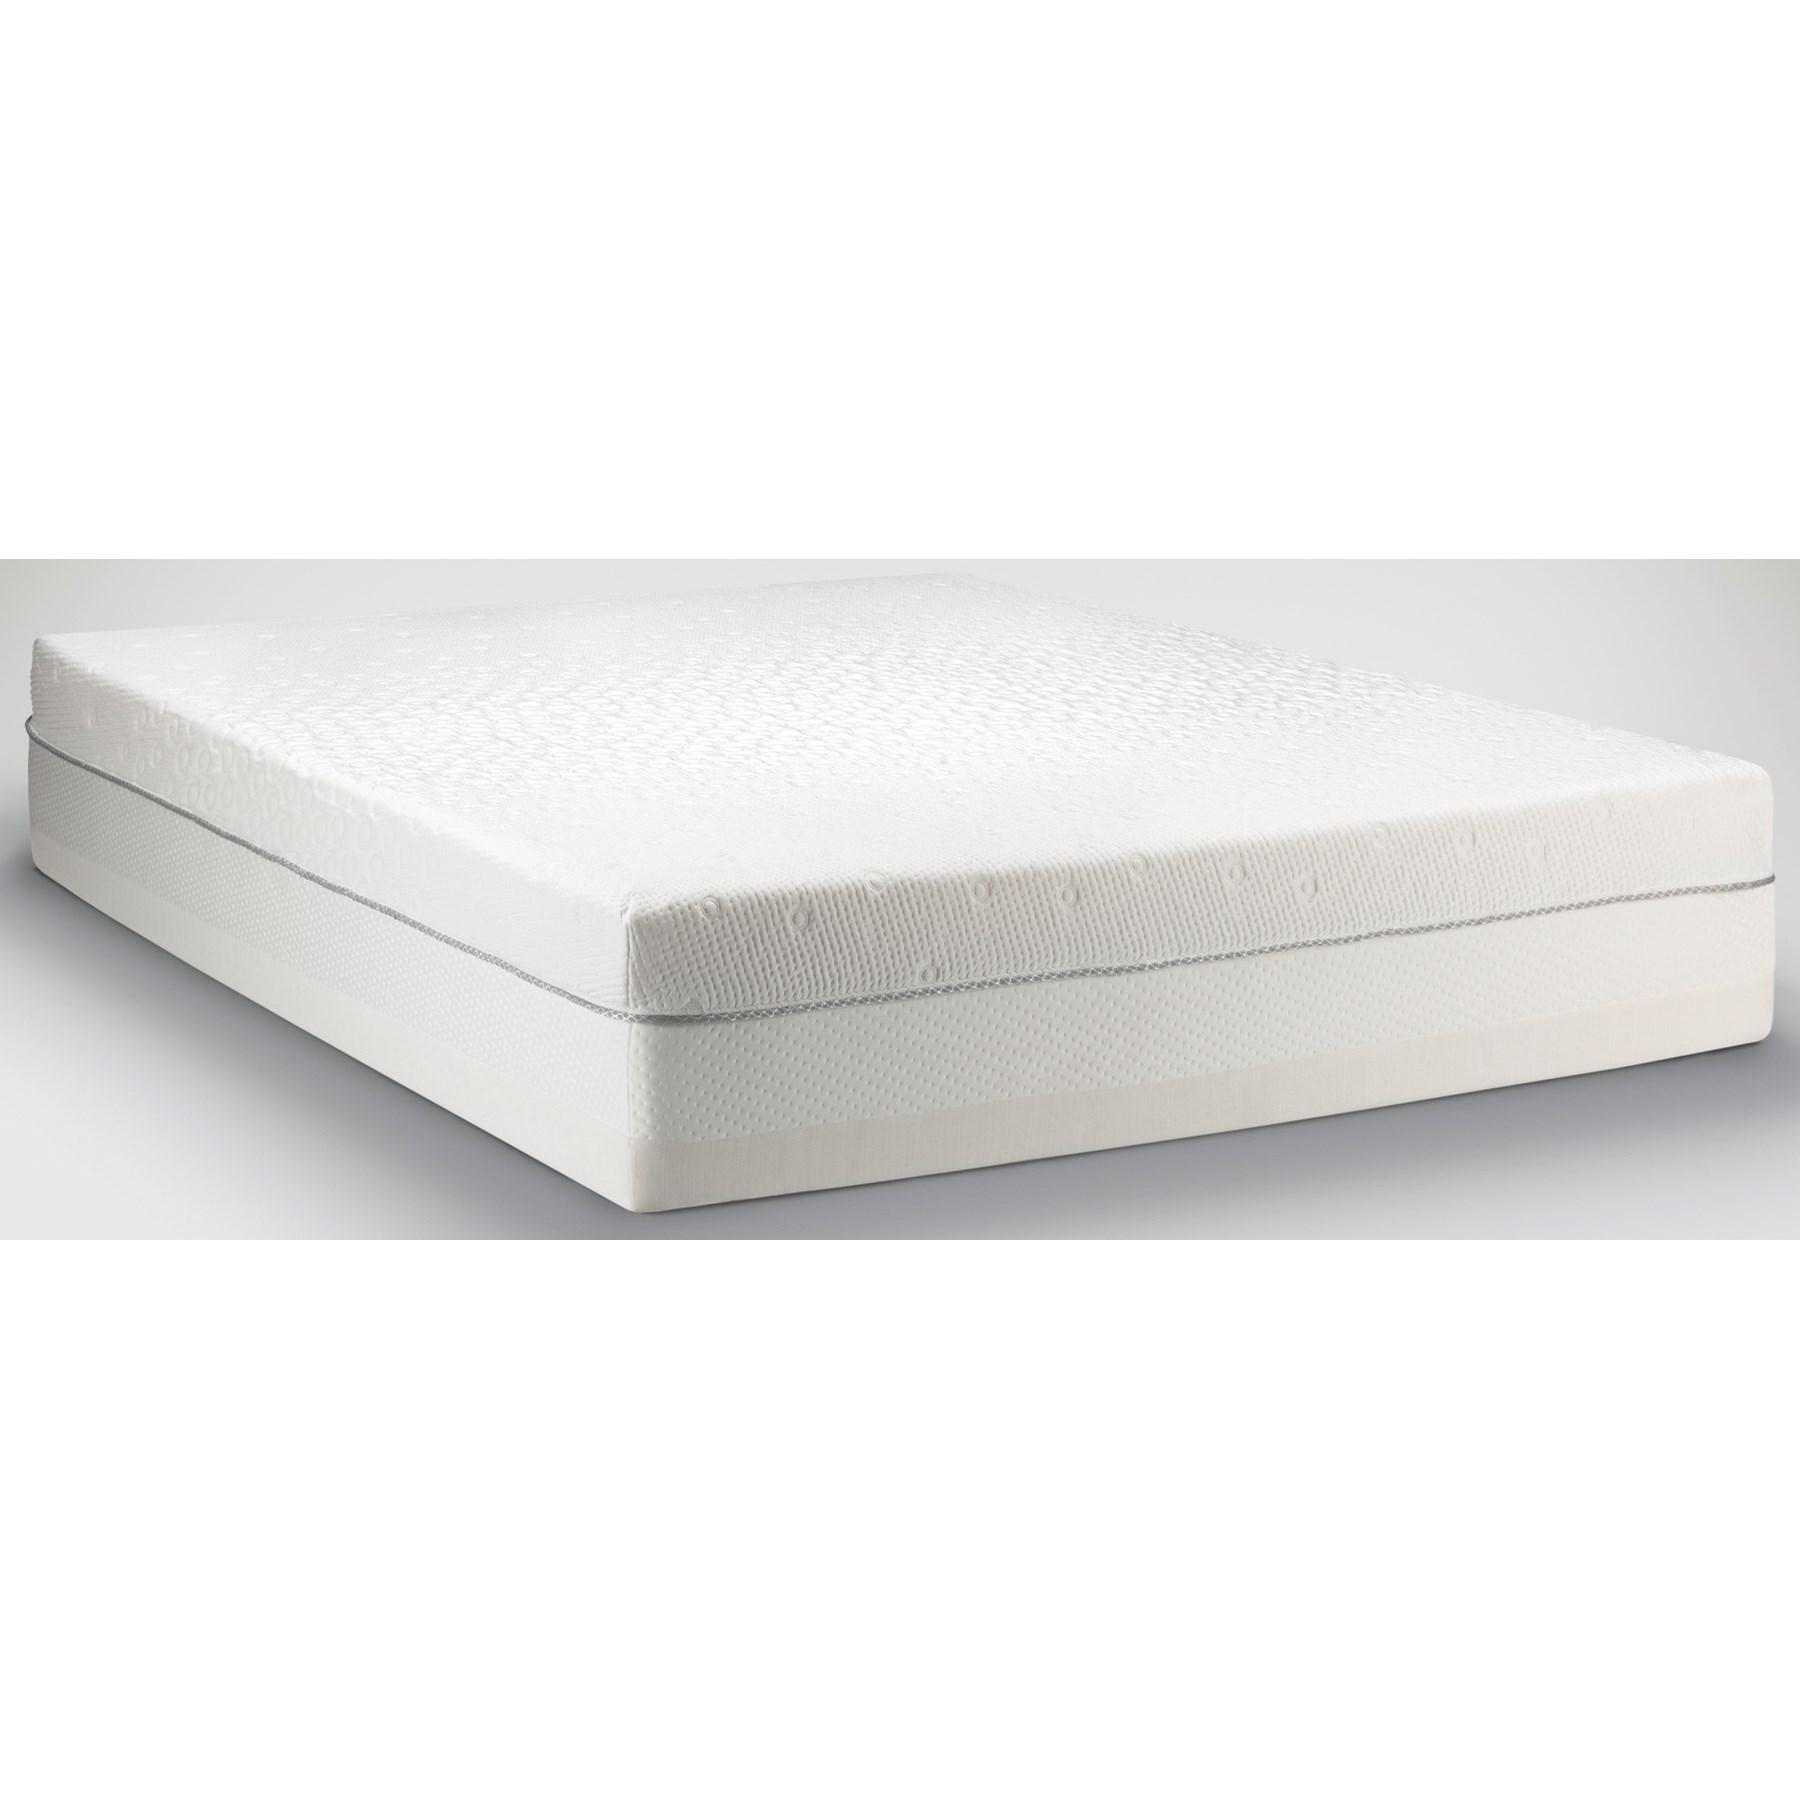 Tempur-Pedic®  TEMPUR-Choice™  Supreme Twin XL Firm to Medium Soft Mattress - Item Number: 10111120